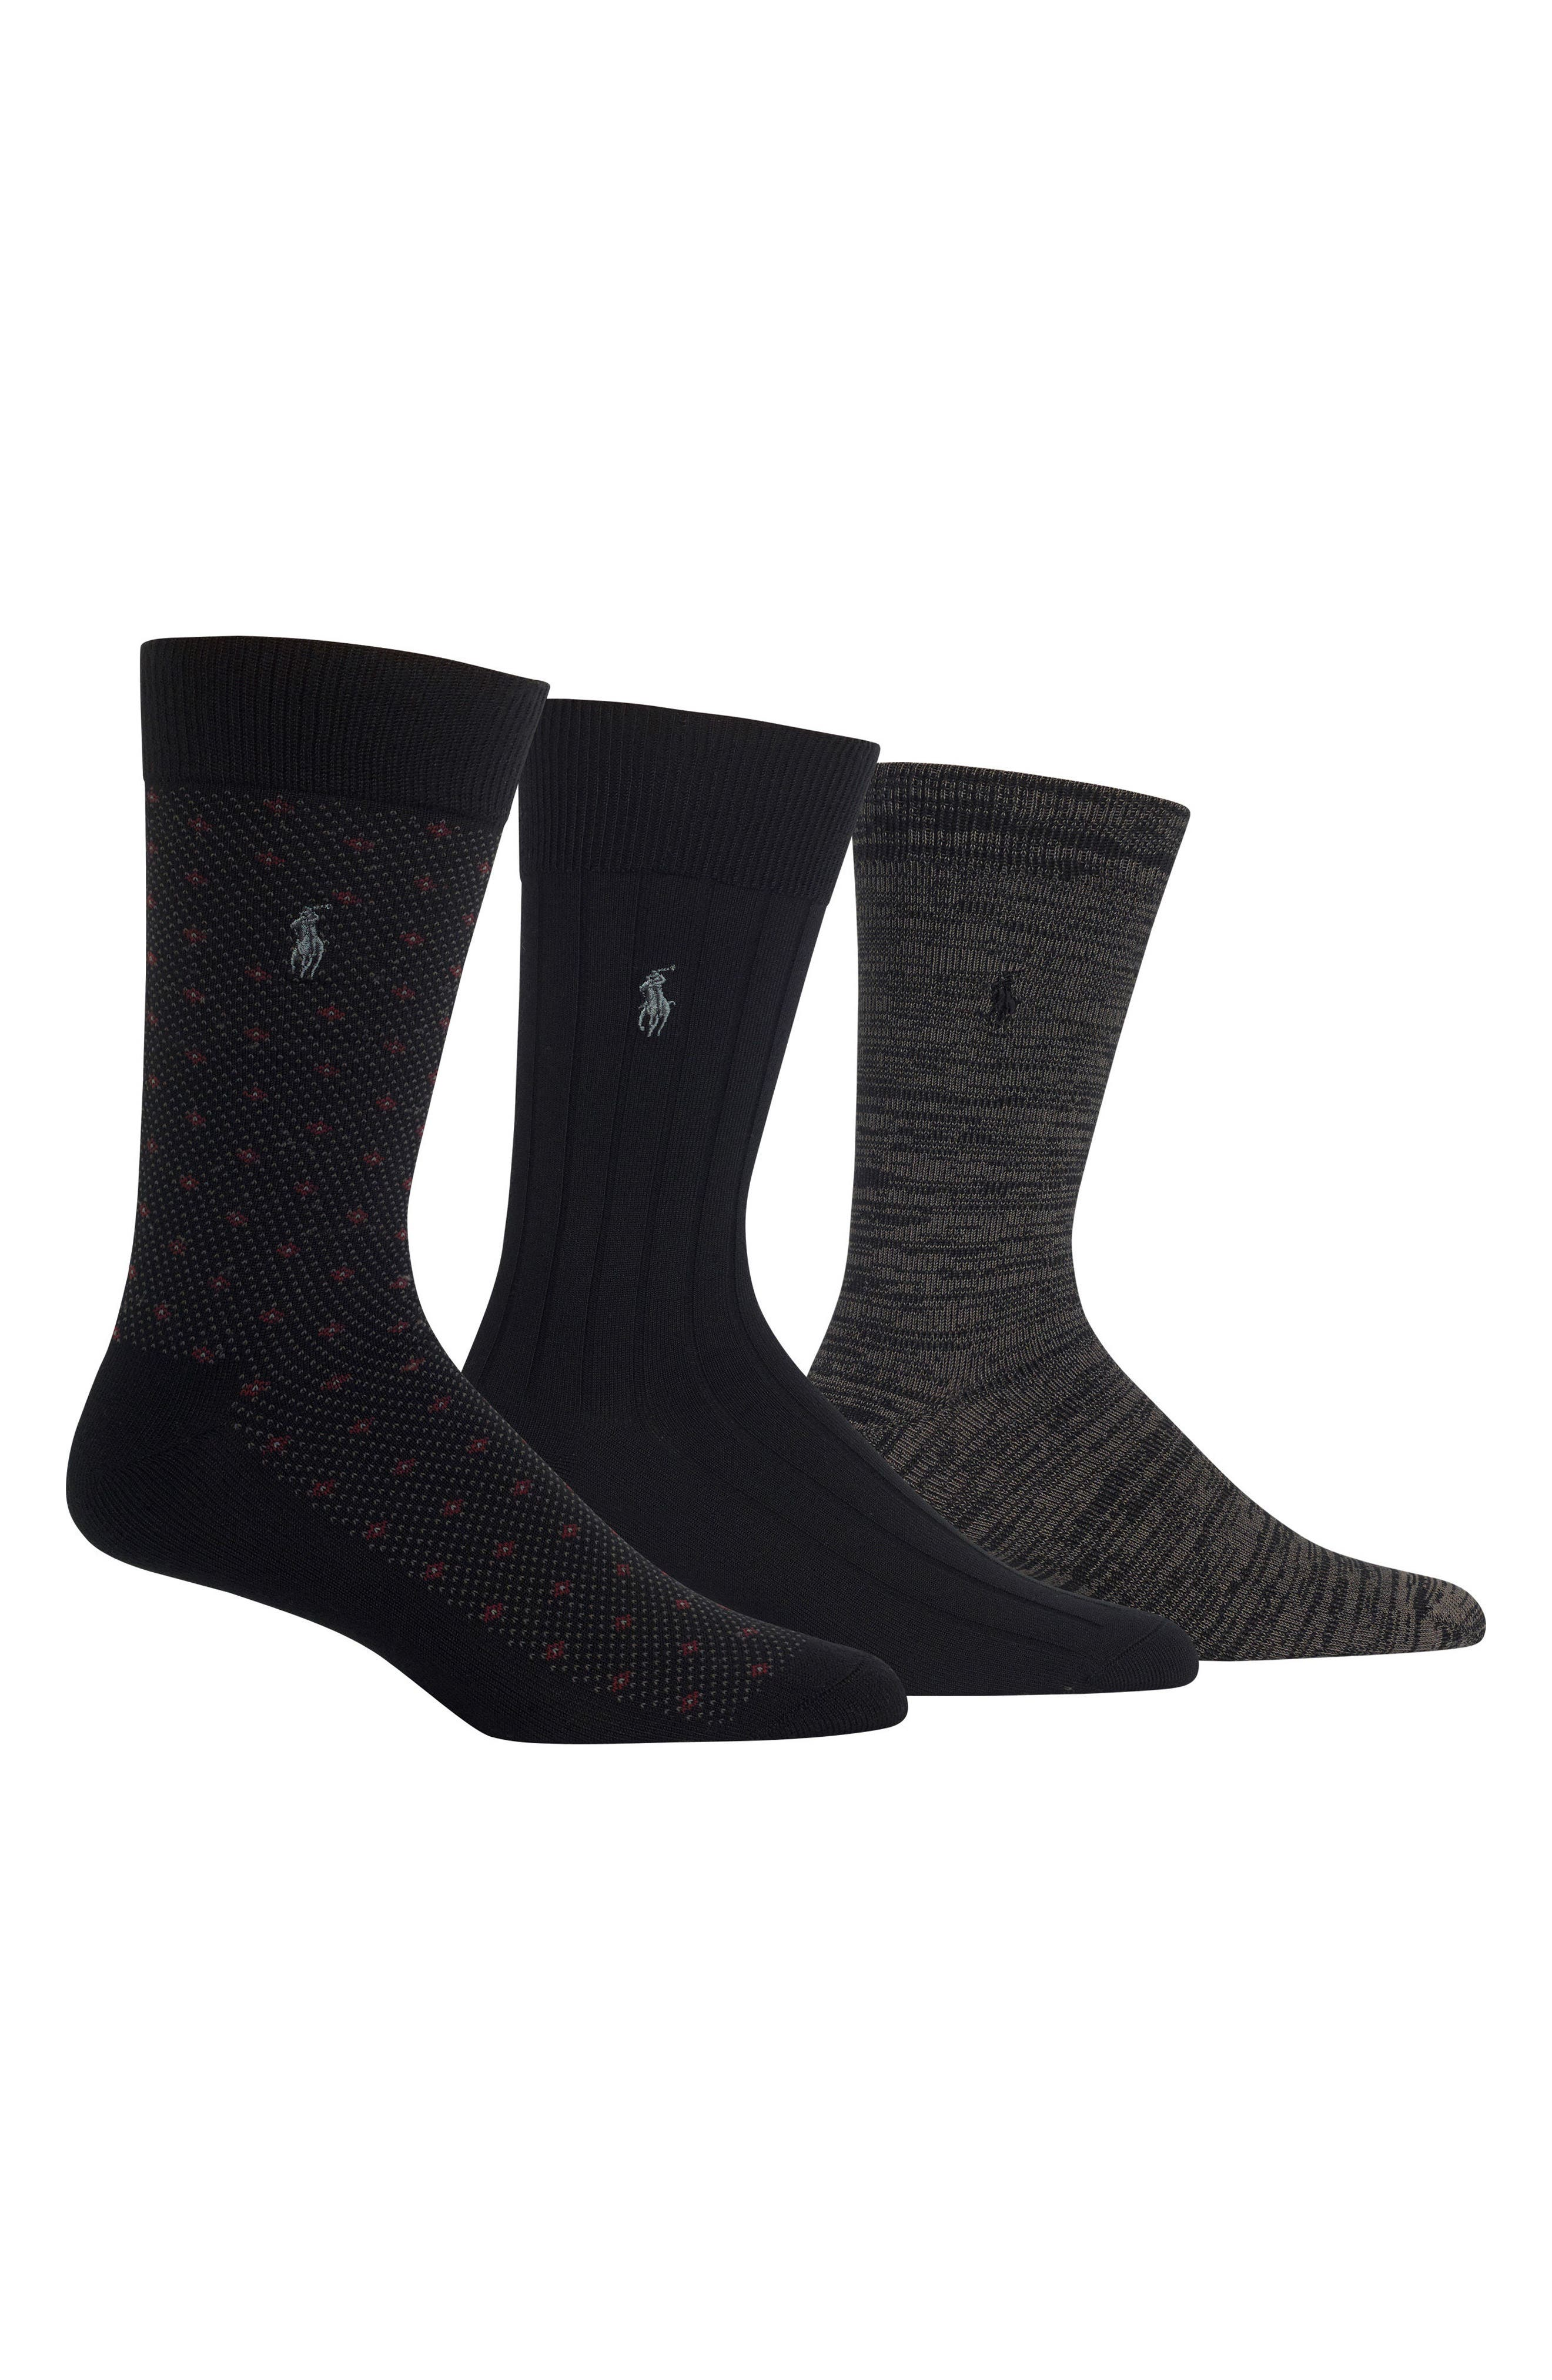 POLO RALPH LAUREN Supersoft Diamond Dot Assorted 3-Pack Socks, Main, color, BLACK